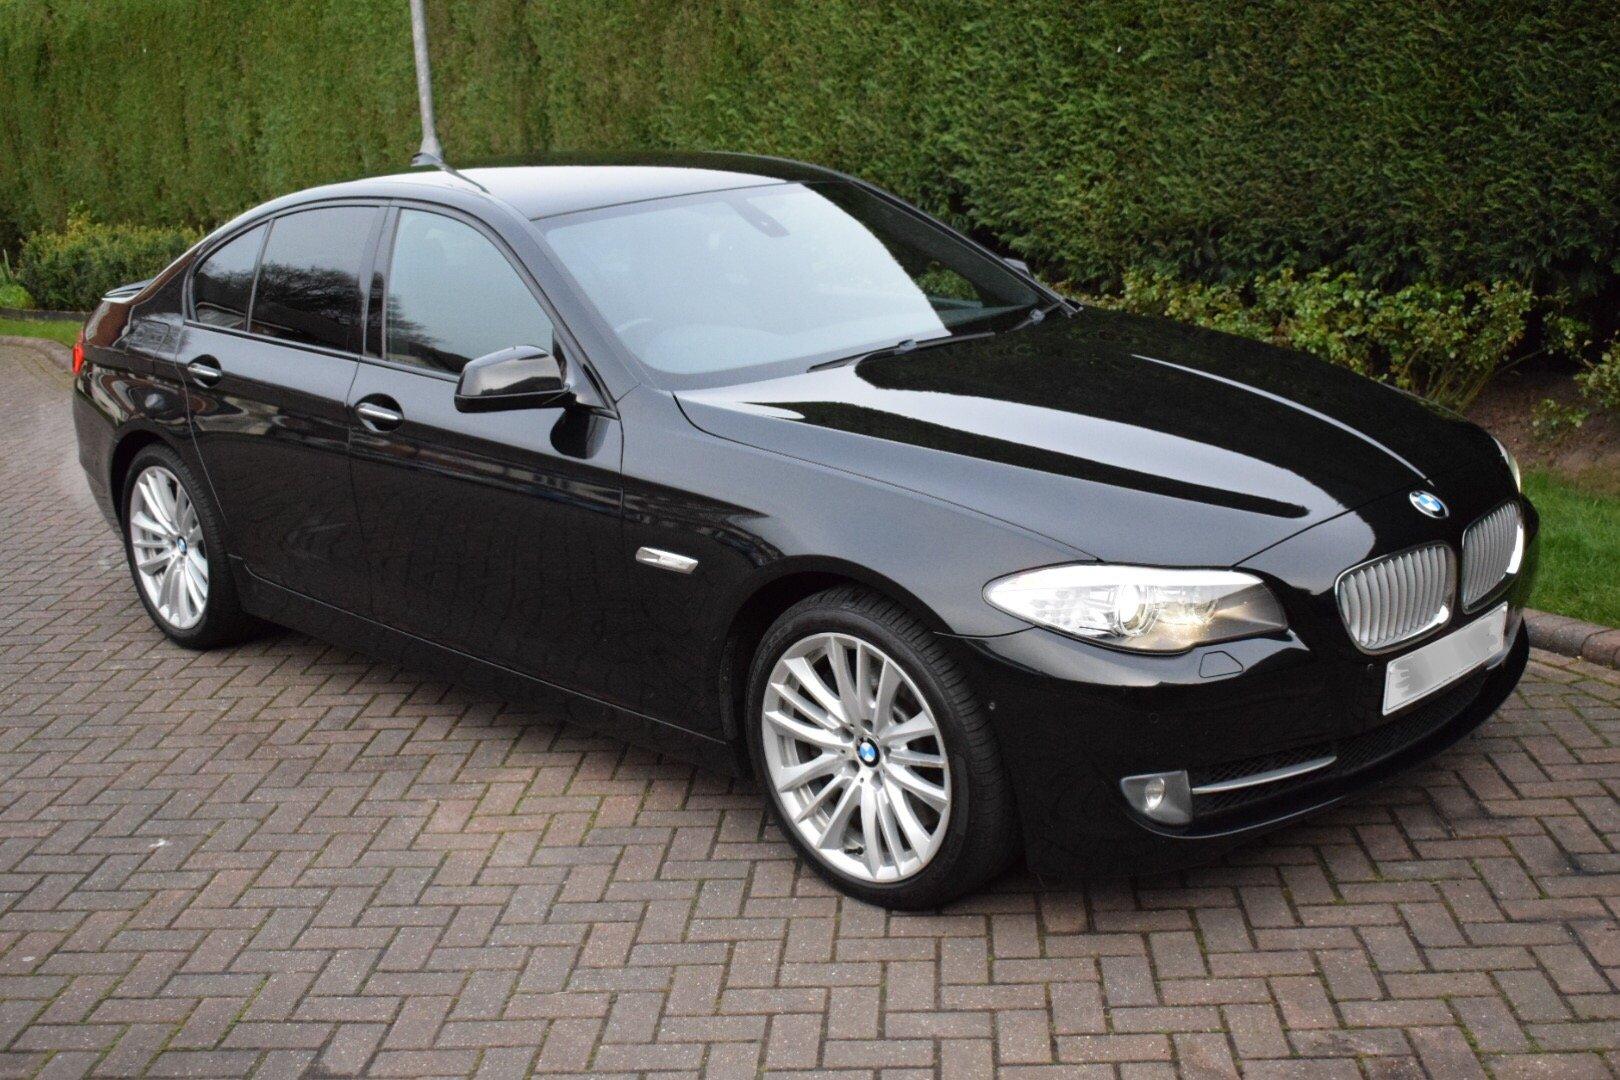 2011 Bmw 550i For Sale >> 2011 BMW 550i F10 4.4L Twin Turbo - Rare car! For Sale